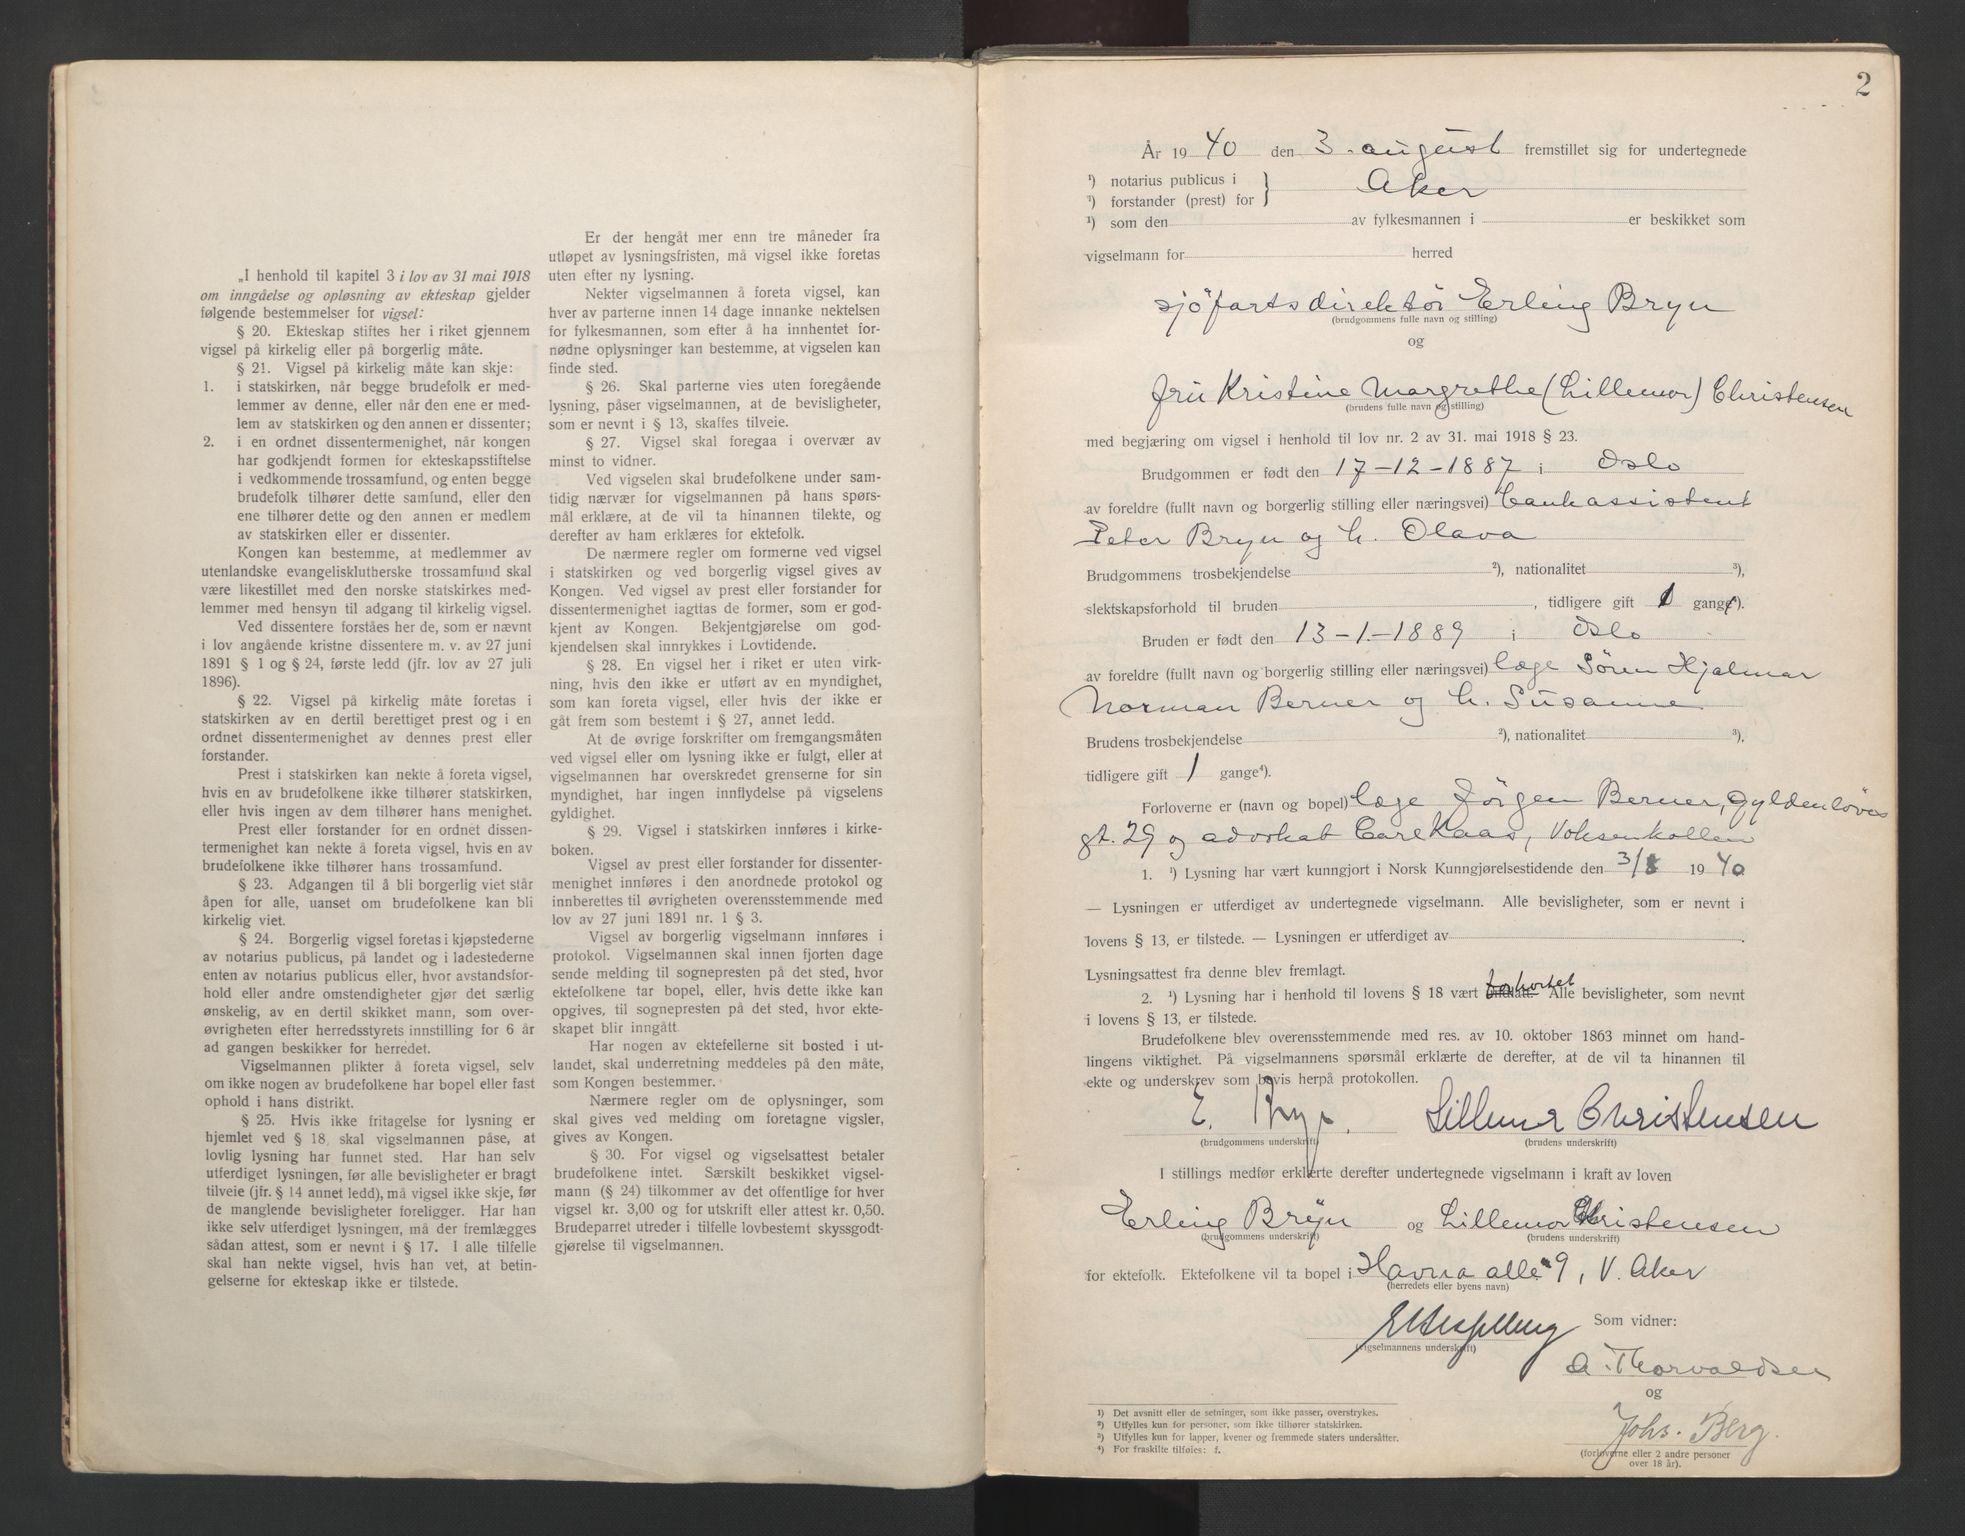 SAO, Aker sorenskriveri, L/Lc/Lcb/L0013: Vigselprotokoll, 1940-1941, s. 2